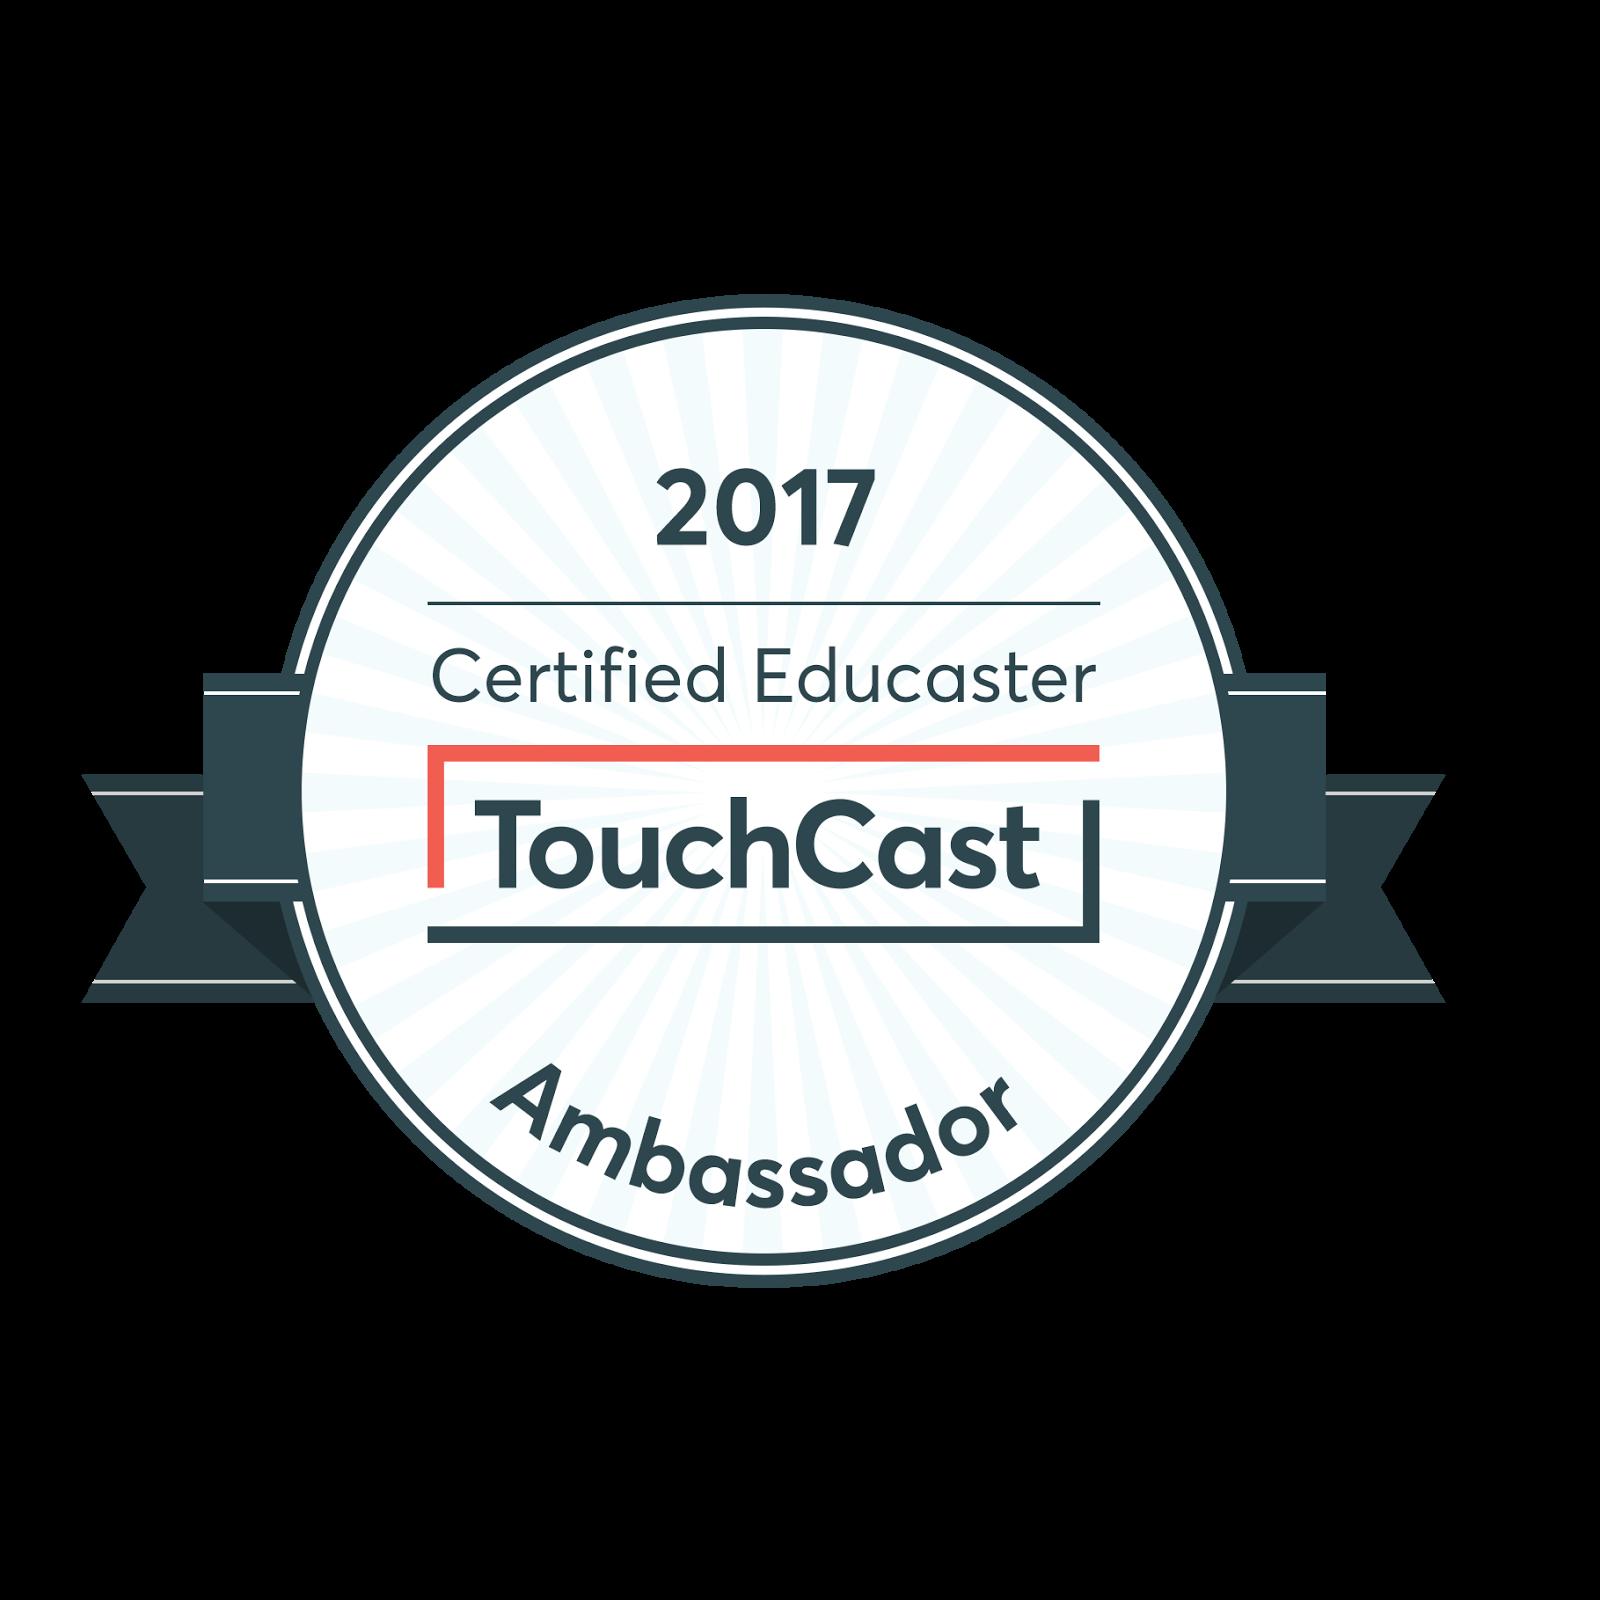 Touchcast Ambassador 2017